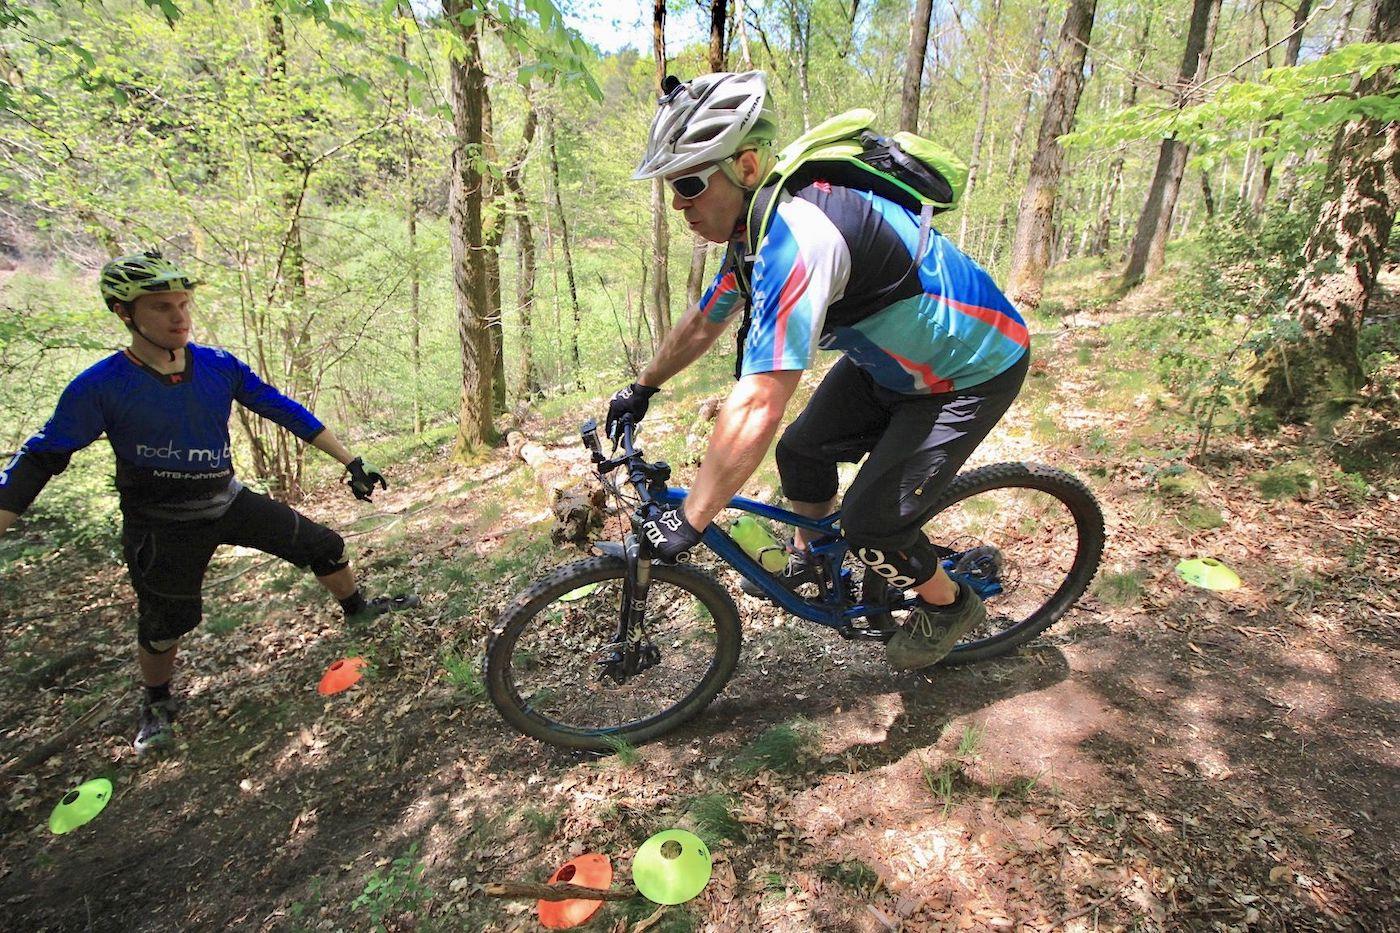 MTB eBike Fahrtechnik Kurse in Frankfurt Oberursel Taunus Anfänger Fortgeschritten Beginner Training Rock my Trail Bikeschule